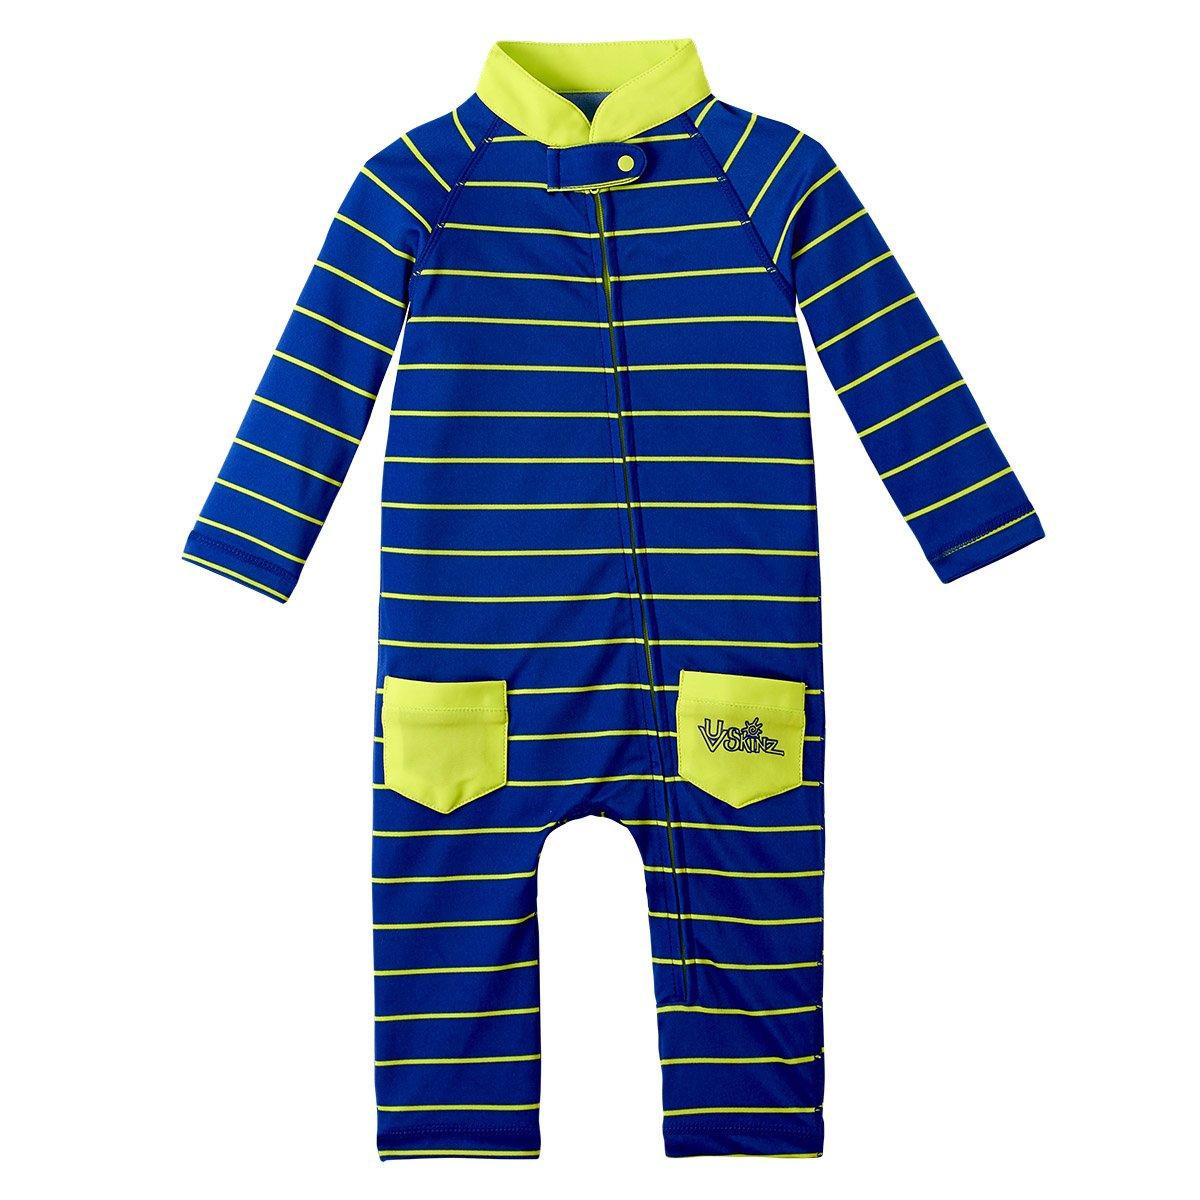 Baby Boy Sun /& Swim Suit-Navy Blue Fun Stripe UV SKINZ UPF50